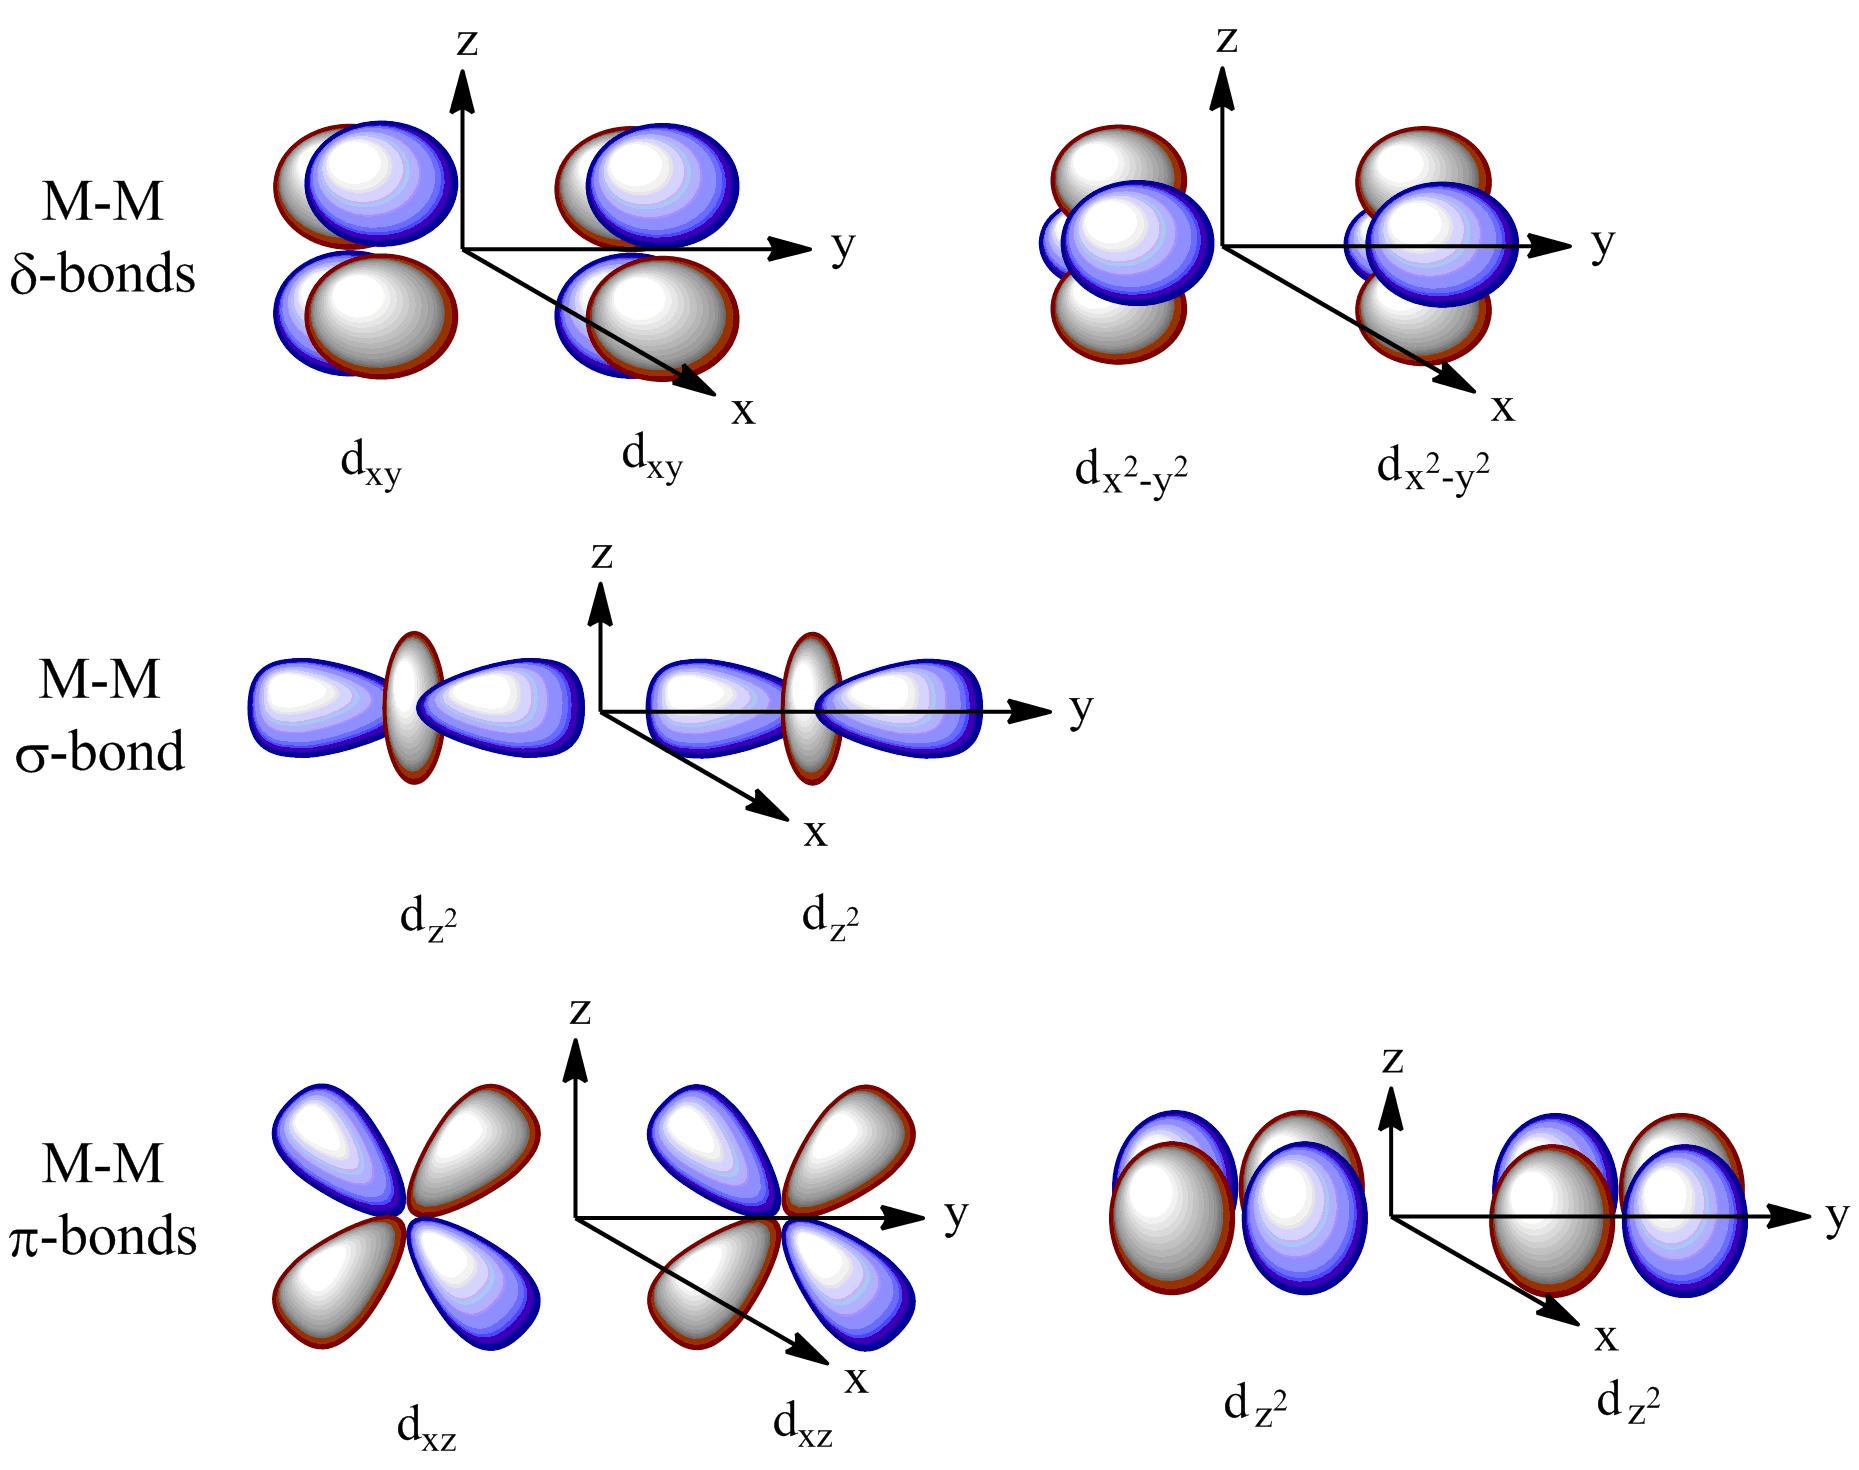 file quintuple bond orbital diagram png wikimedia commons : orbitals diagram - findchart.co